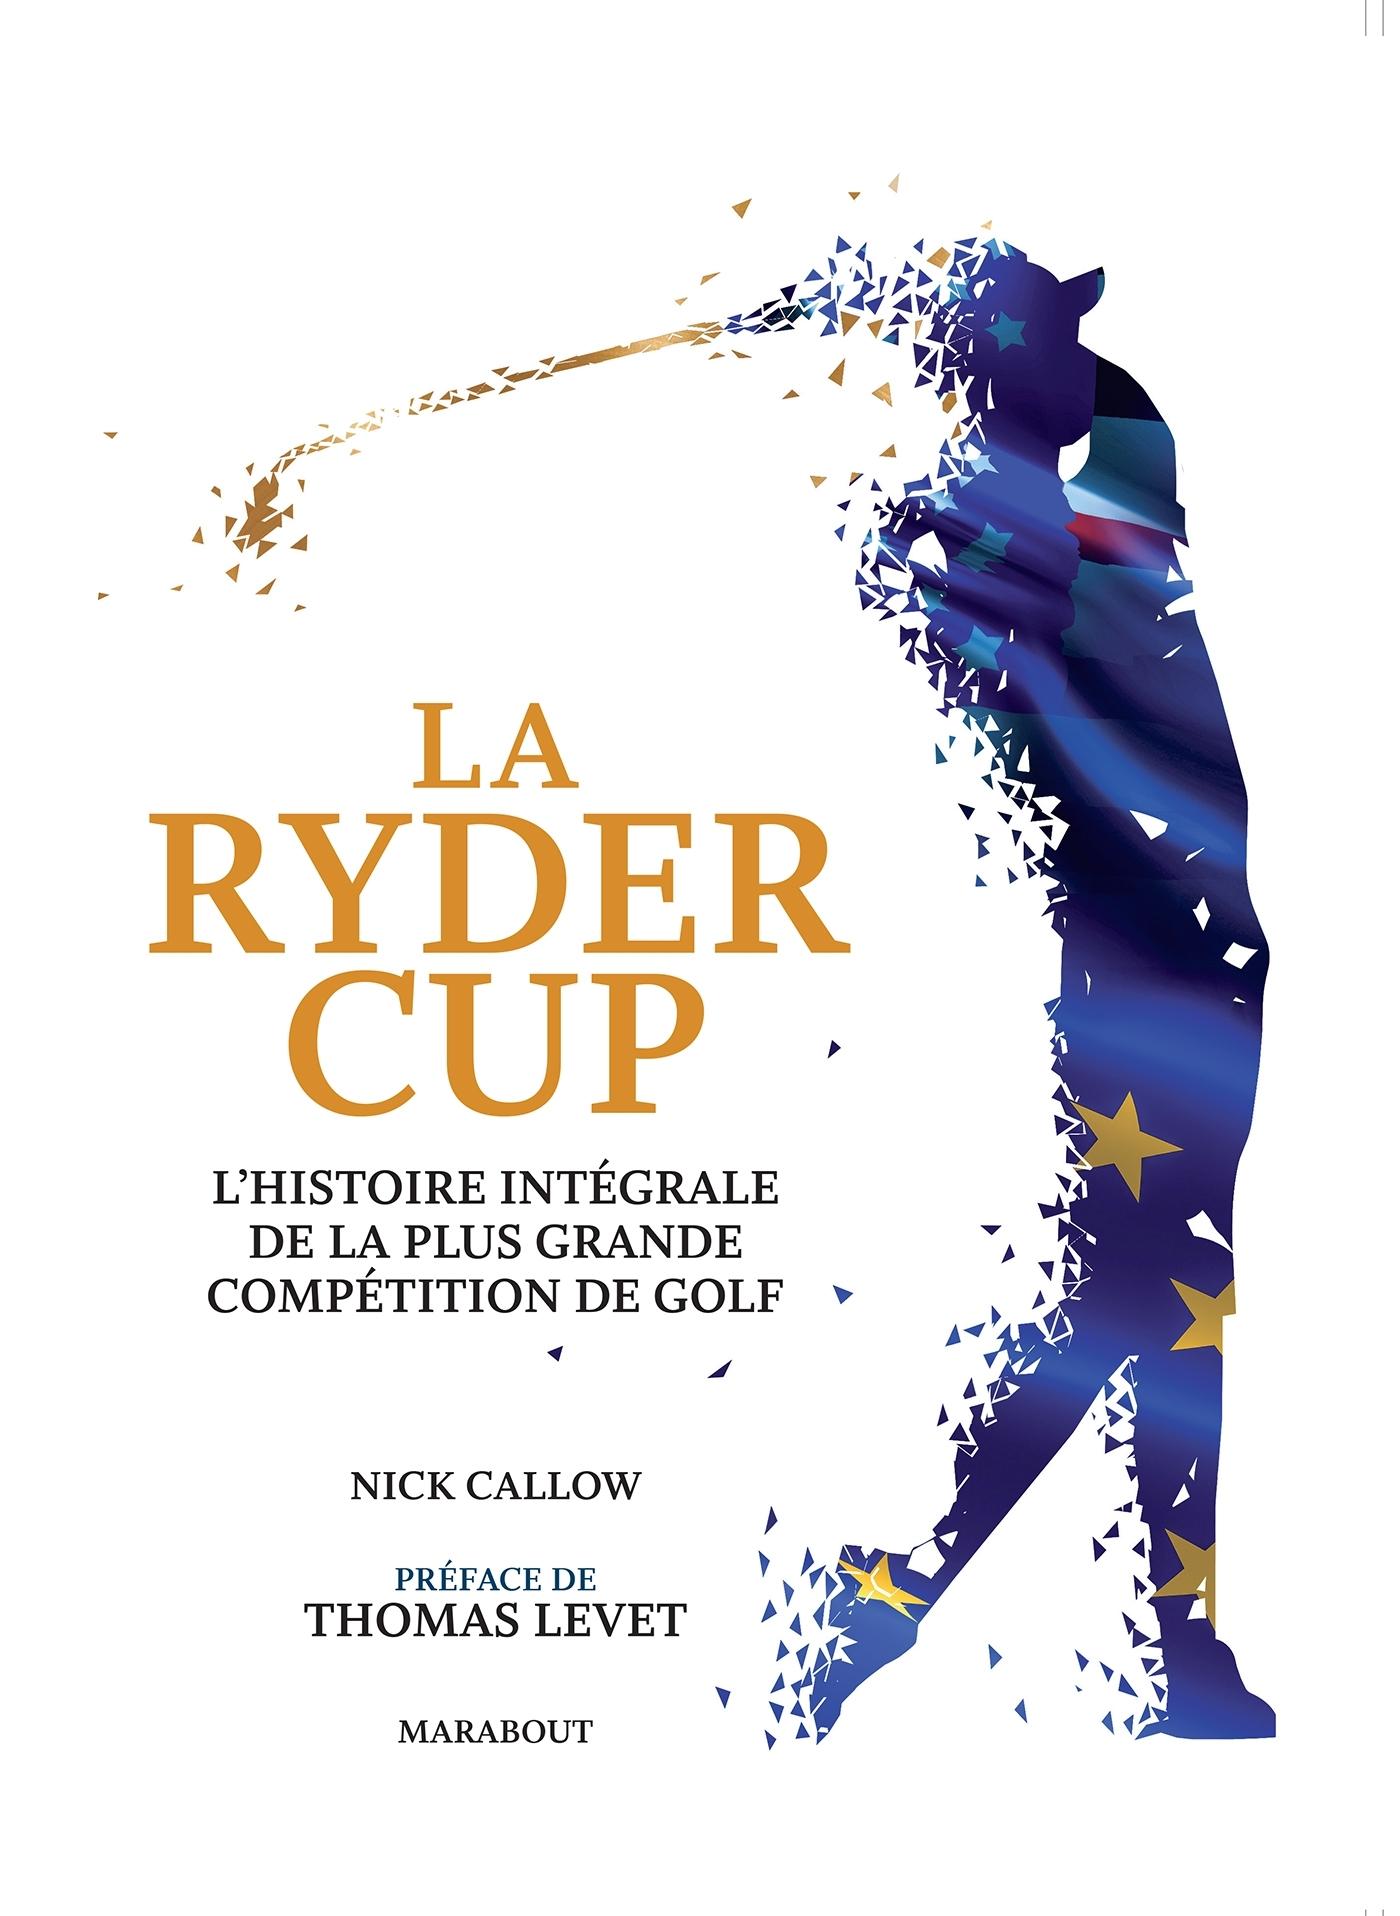 RYDER CUP - L'EVENEMENT SPORTIF DE L'ANNEE